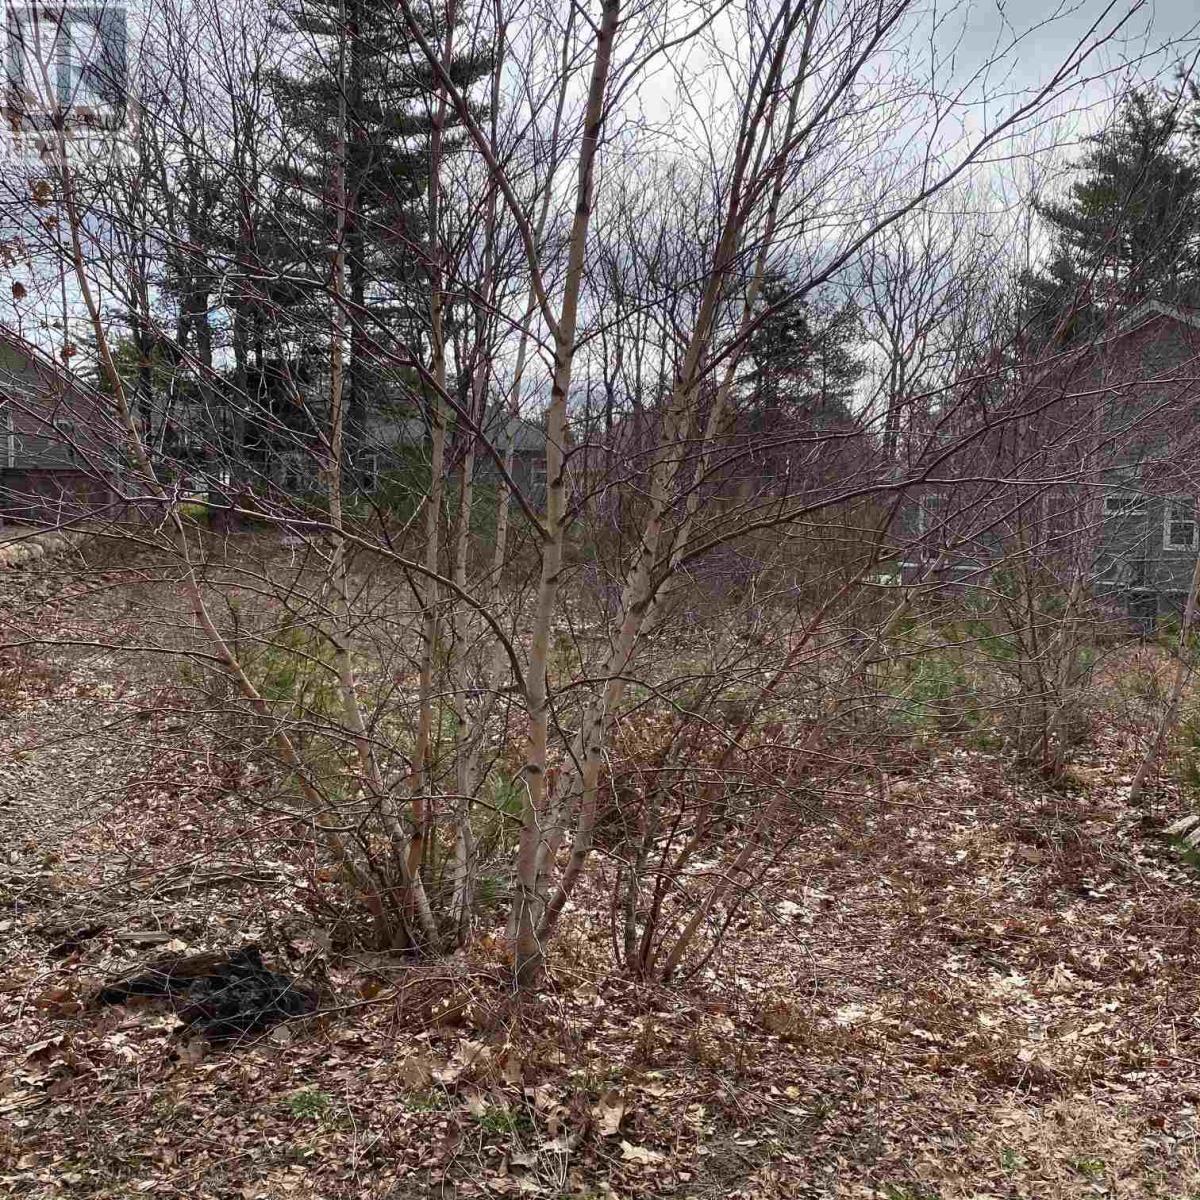 Lot 21 Acorn Drive, Bridgewater, Nova Scotia  B4V 8Z1 - Photo 2 - 201711031